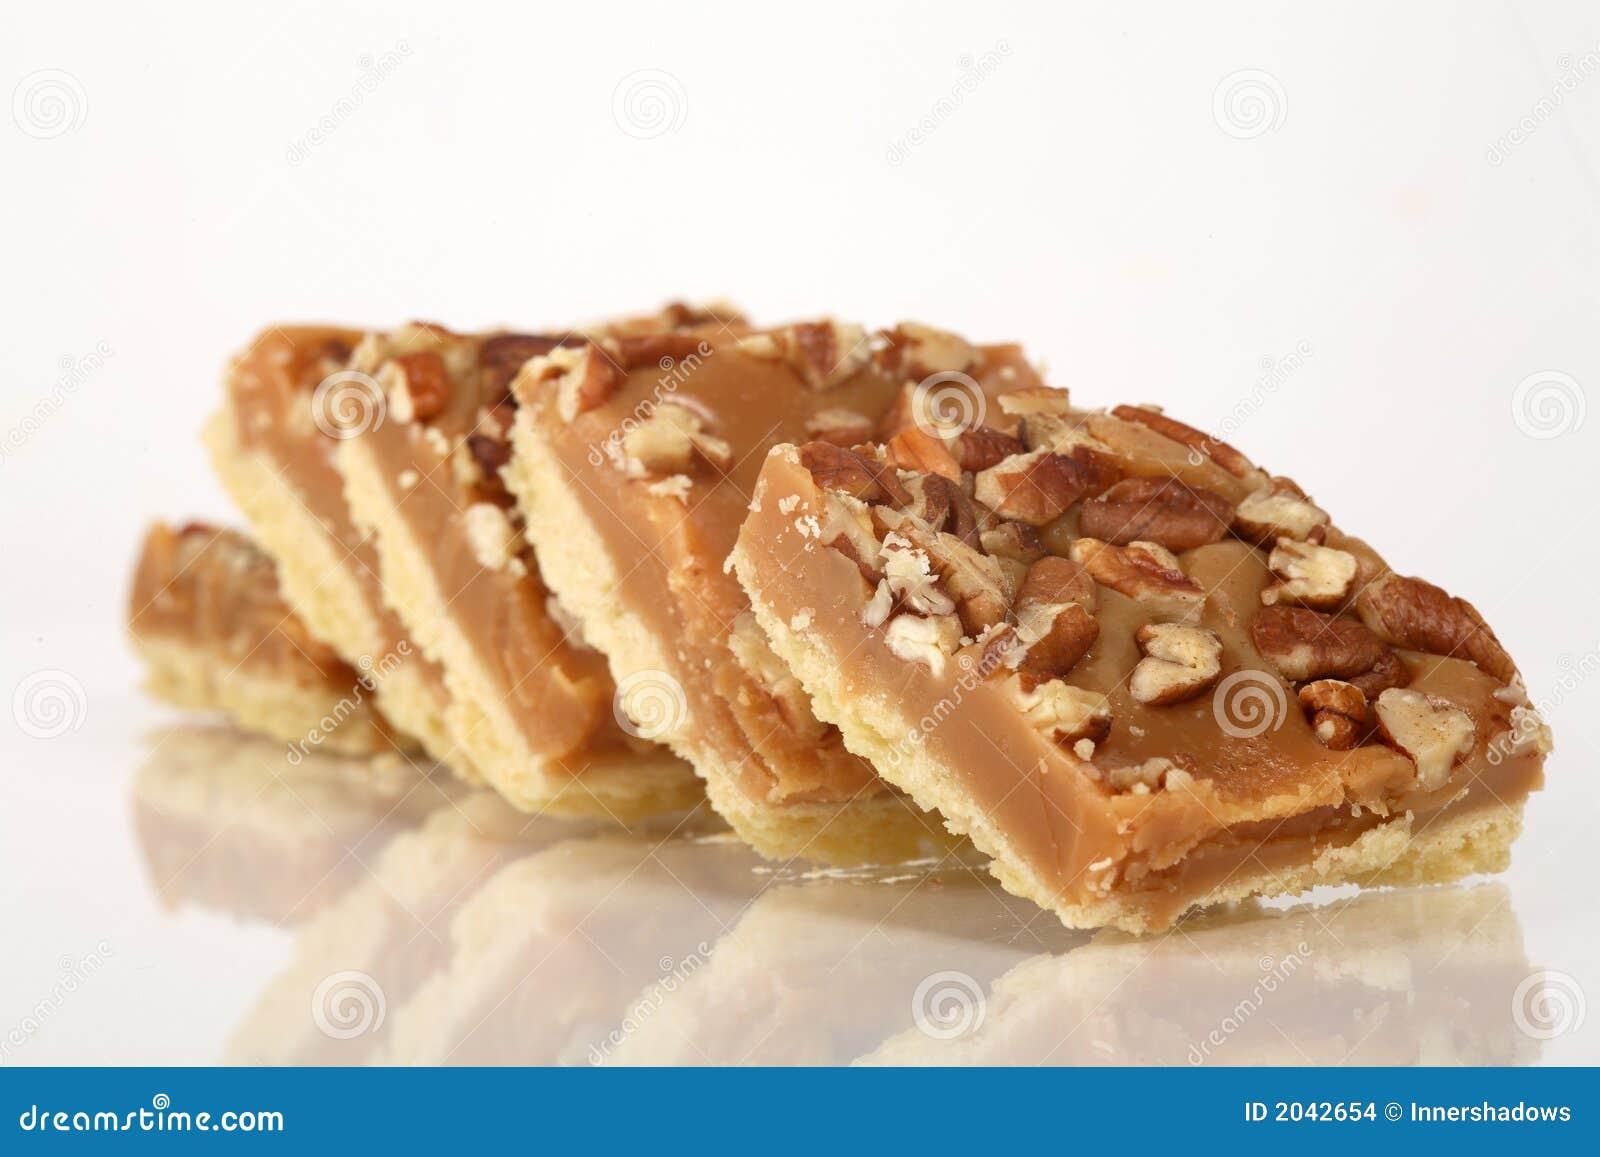 Pecan Caramel Shortbread Cakes Stock Images - Image: 2042654